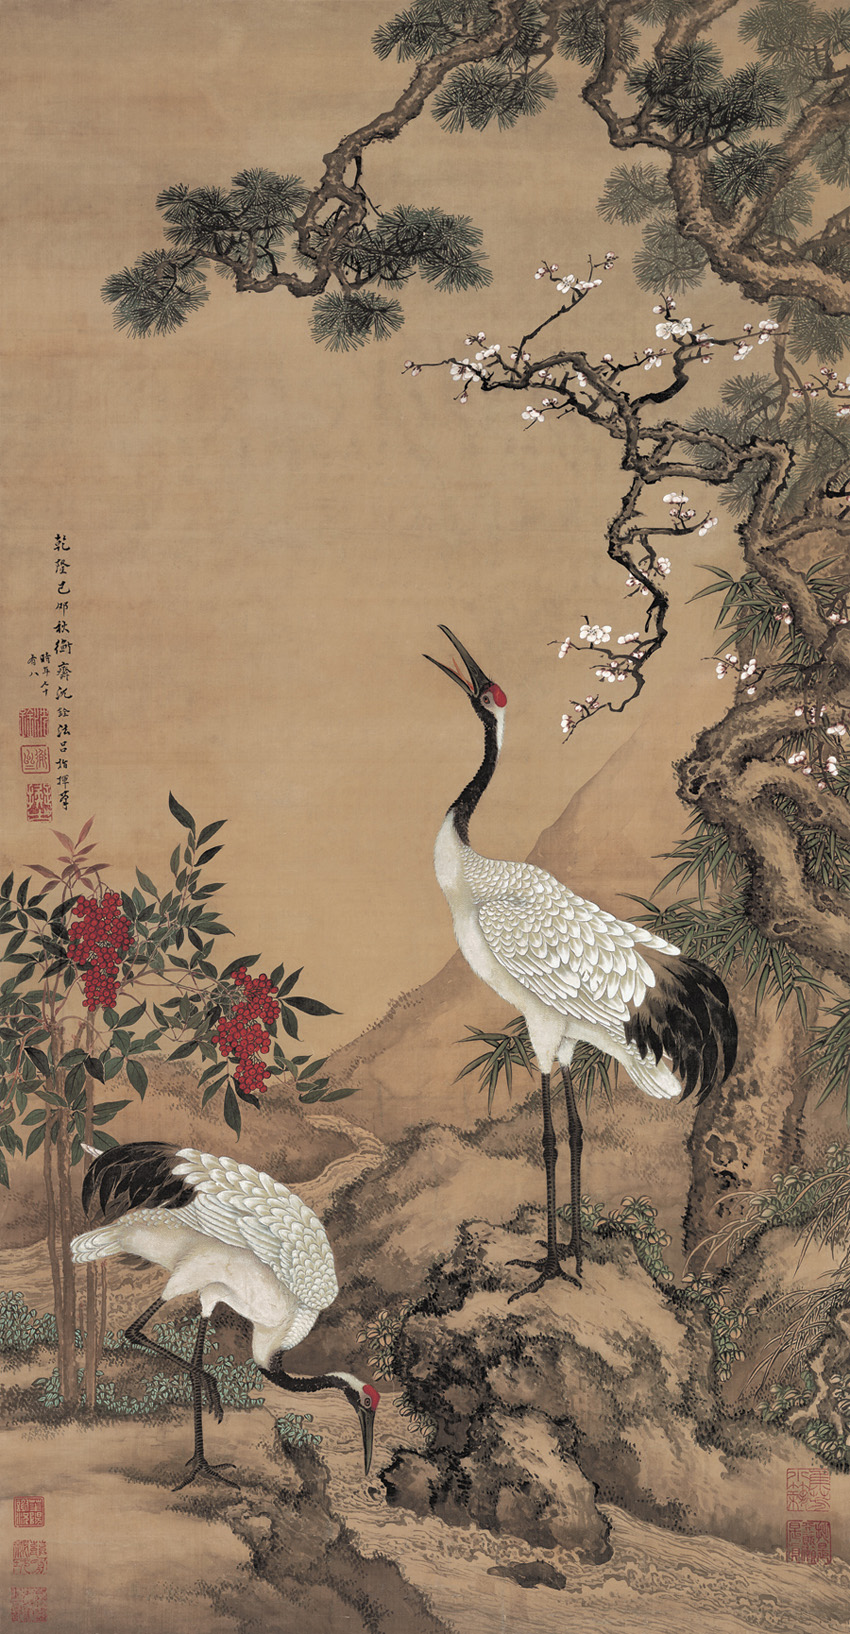 shen-quan_pine-plum-and-two-cranes.jpg